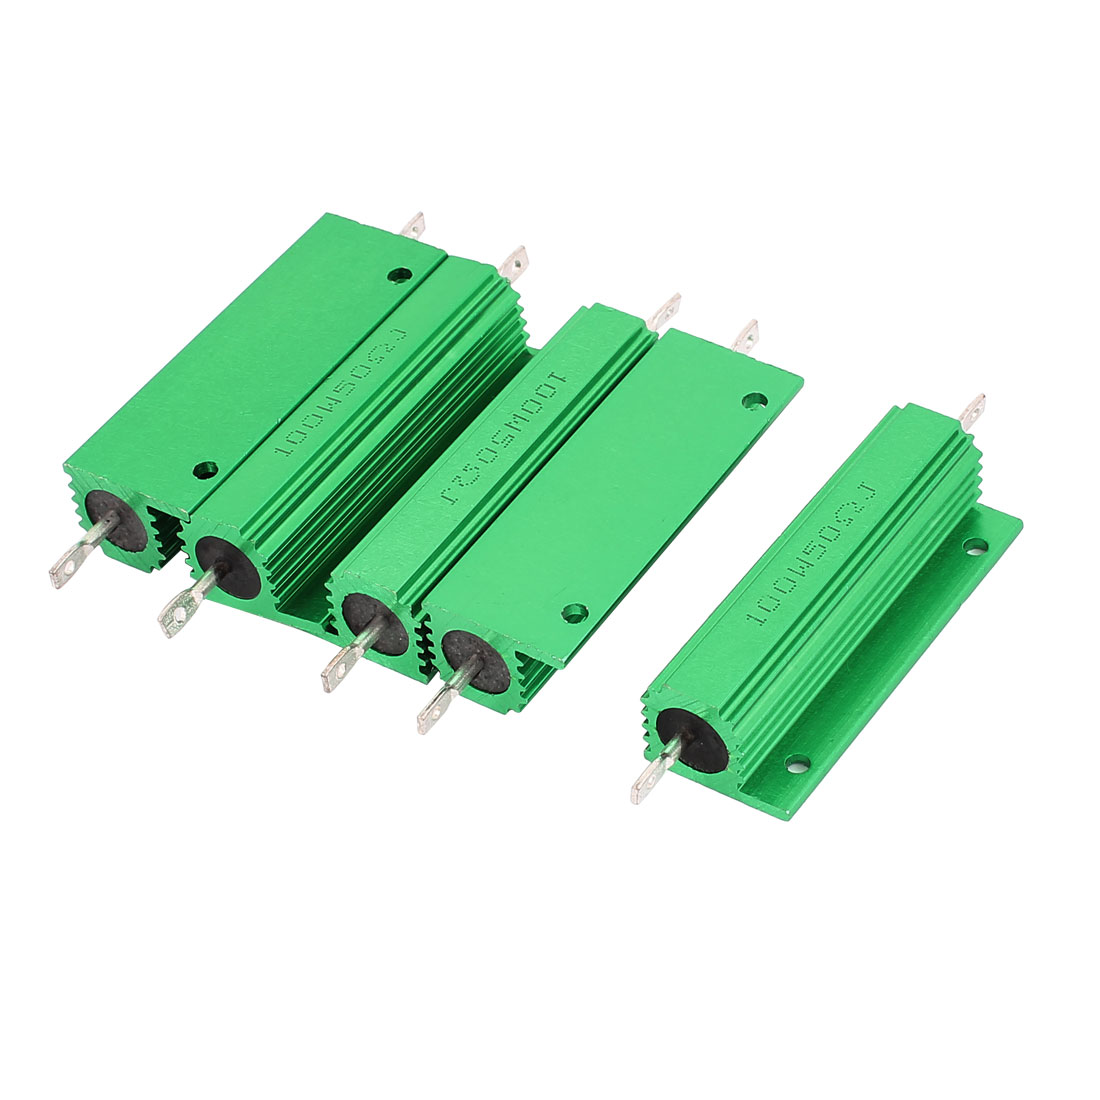 5Pcs Aluminum Housed 100W Watt 50 Ohm 5% Tolerance Fixed Resistor Green